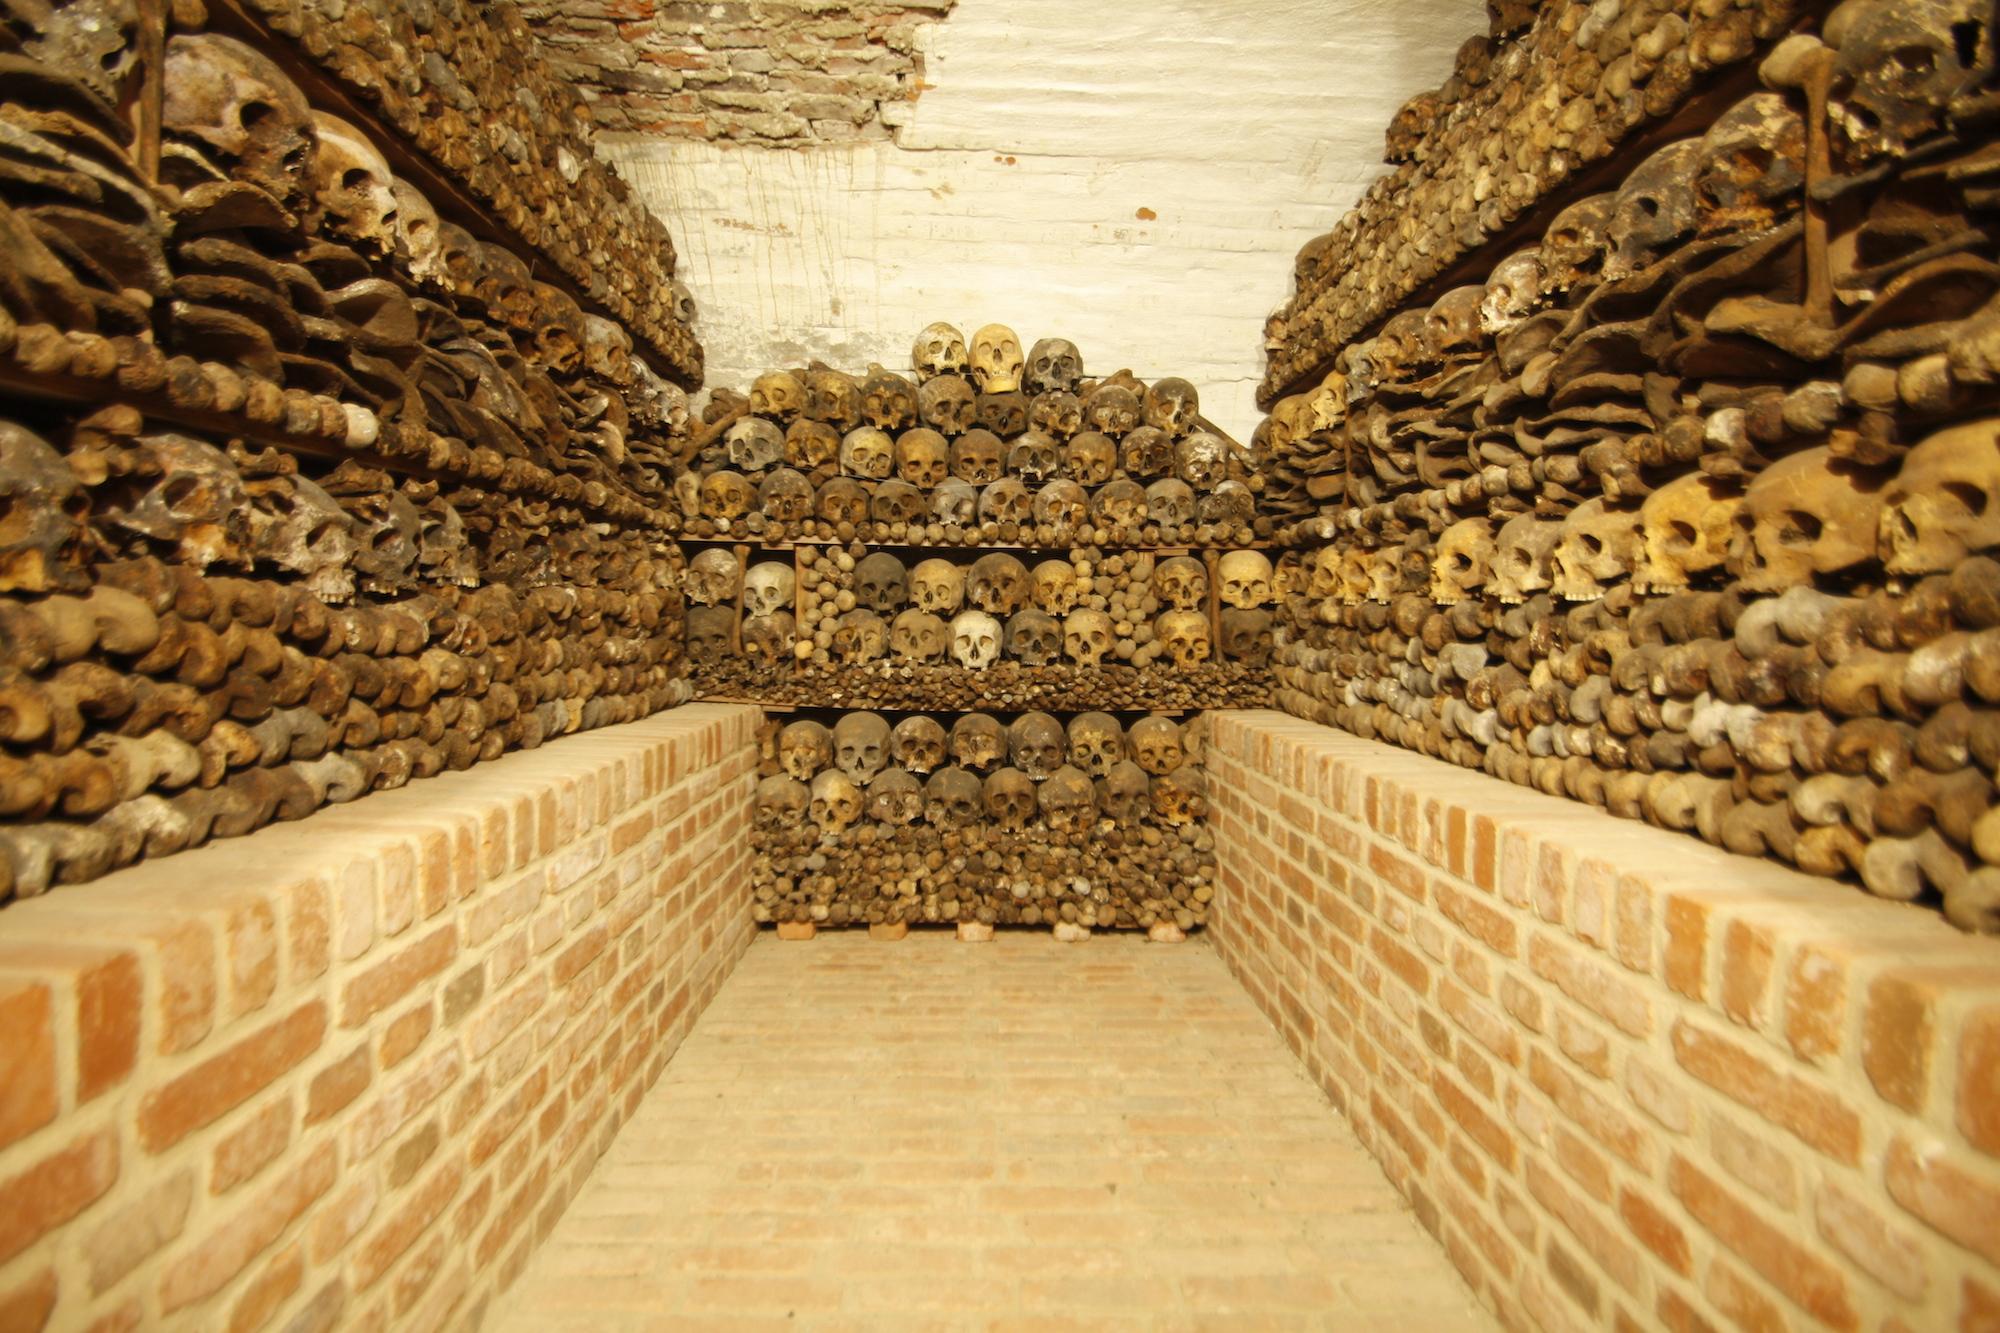 St. Joseph Bone Crypt